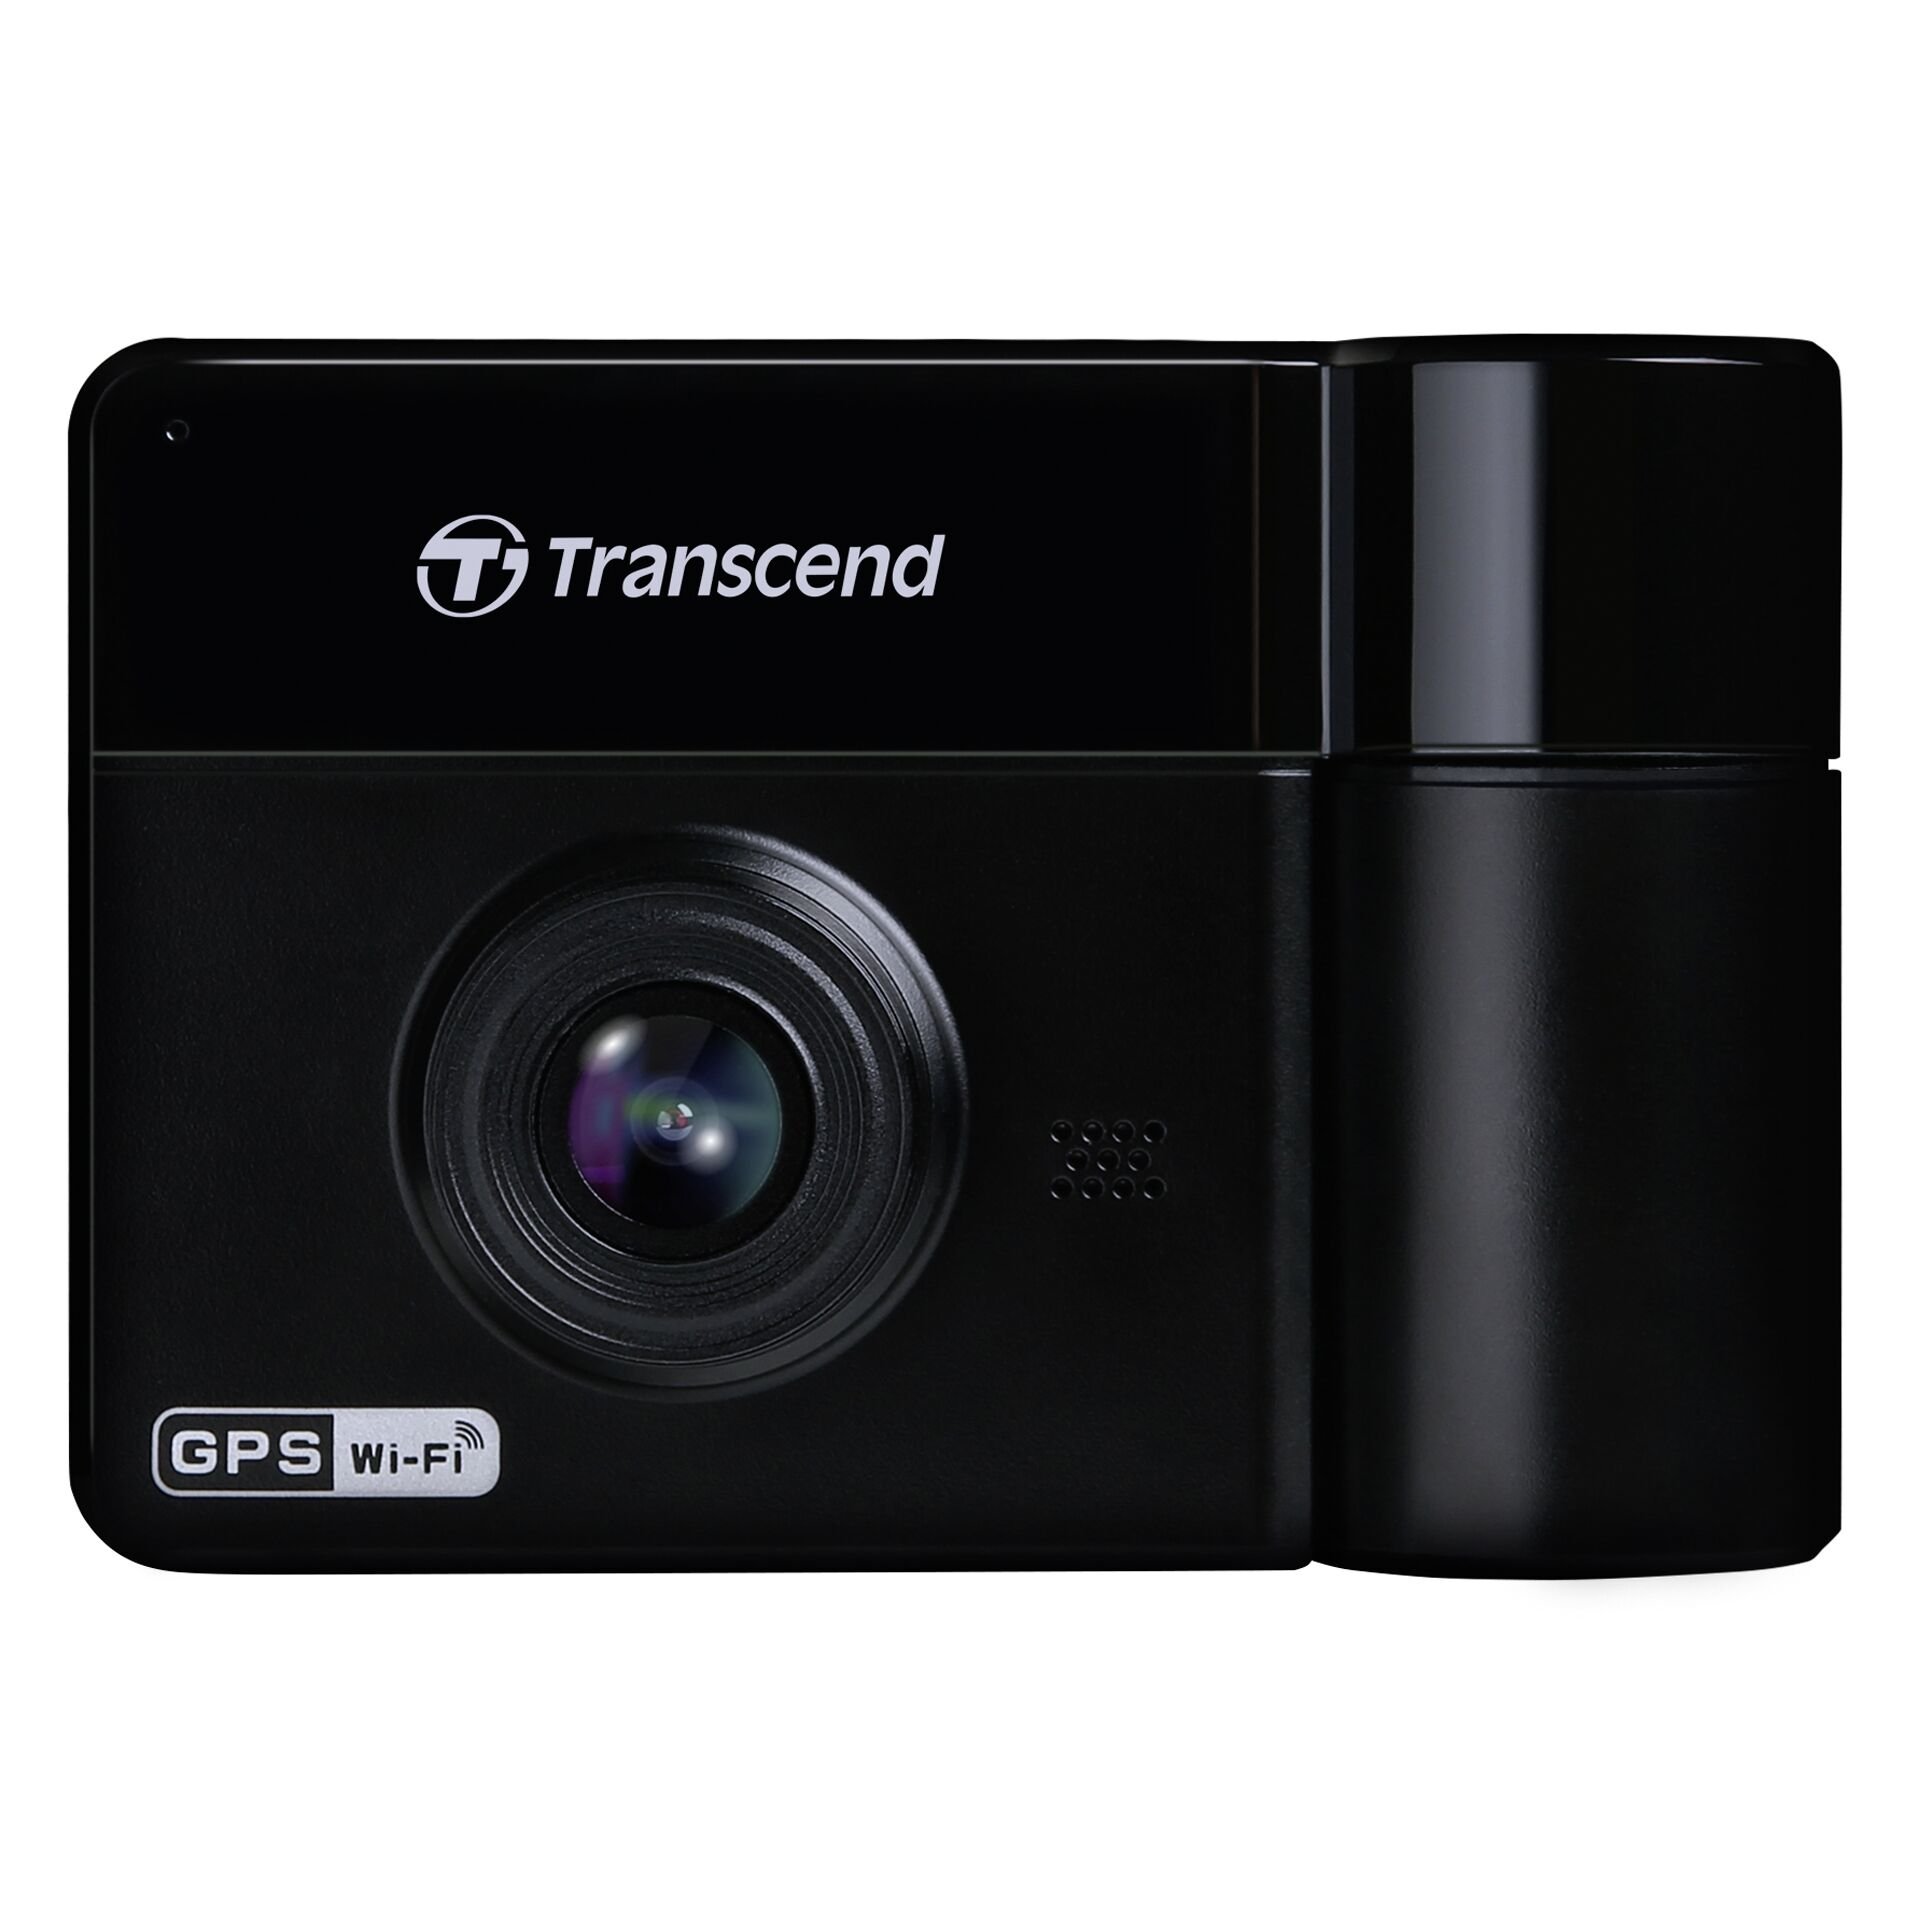 Transcend DrivePro 550 Dual 1080 Camera with 64GB microSD